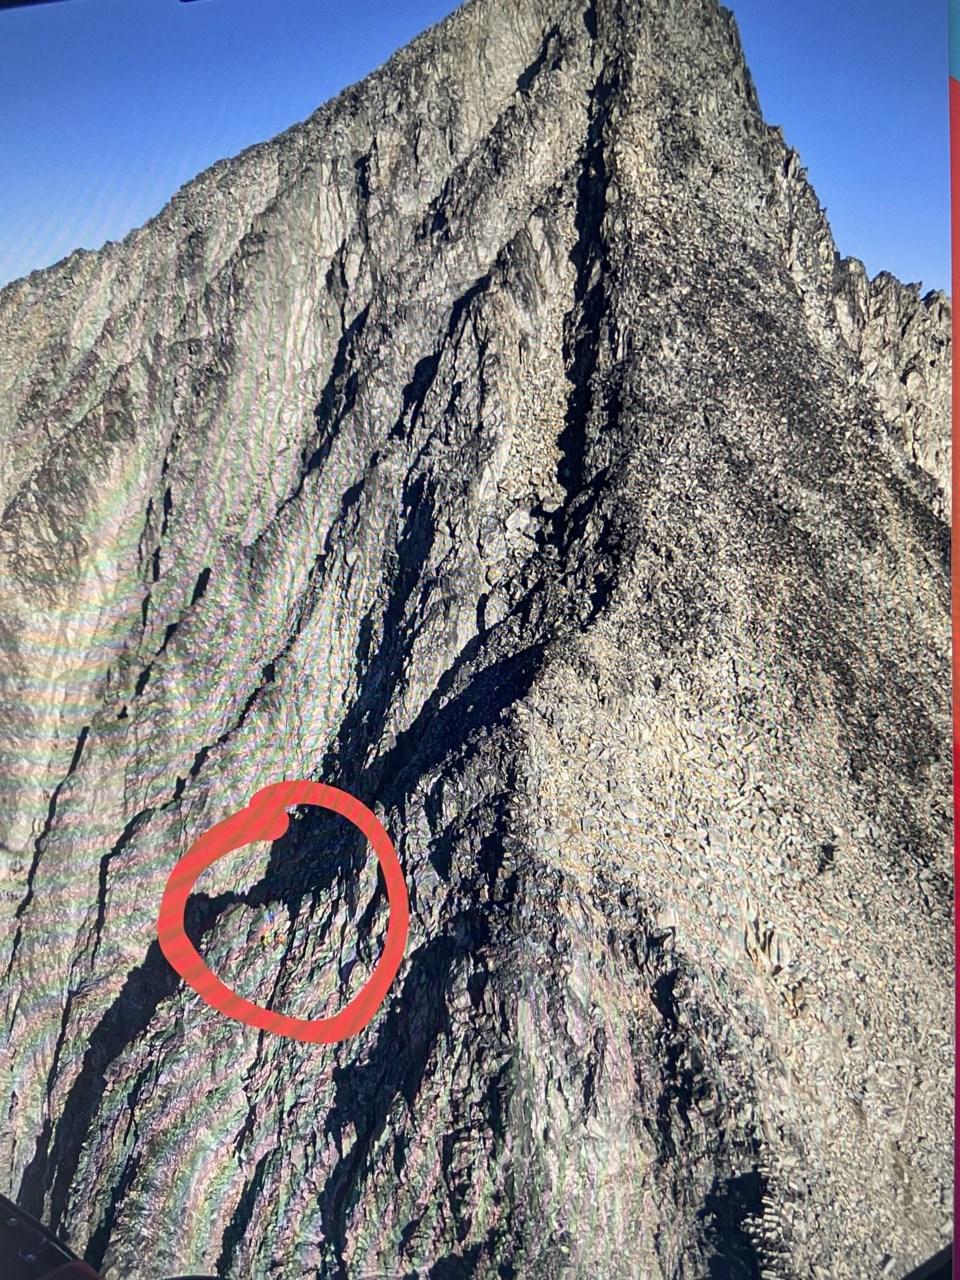 N-Mt Weart Rescue 28.37 COURTESY OF WSAR